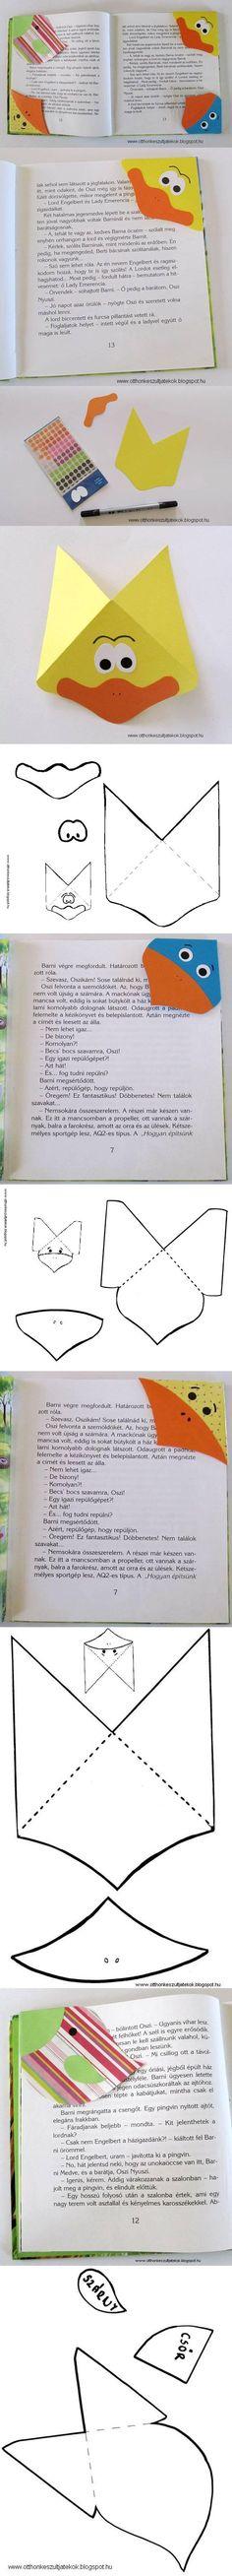 segnalibri bookmarks: